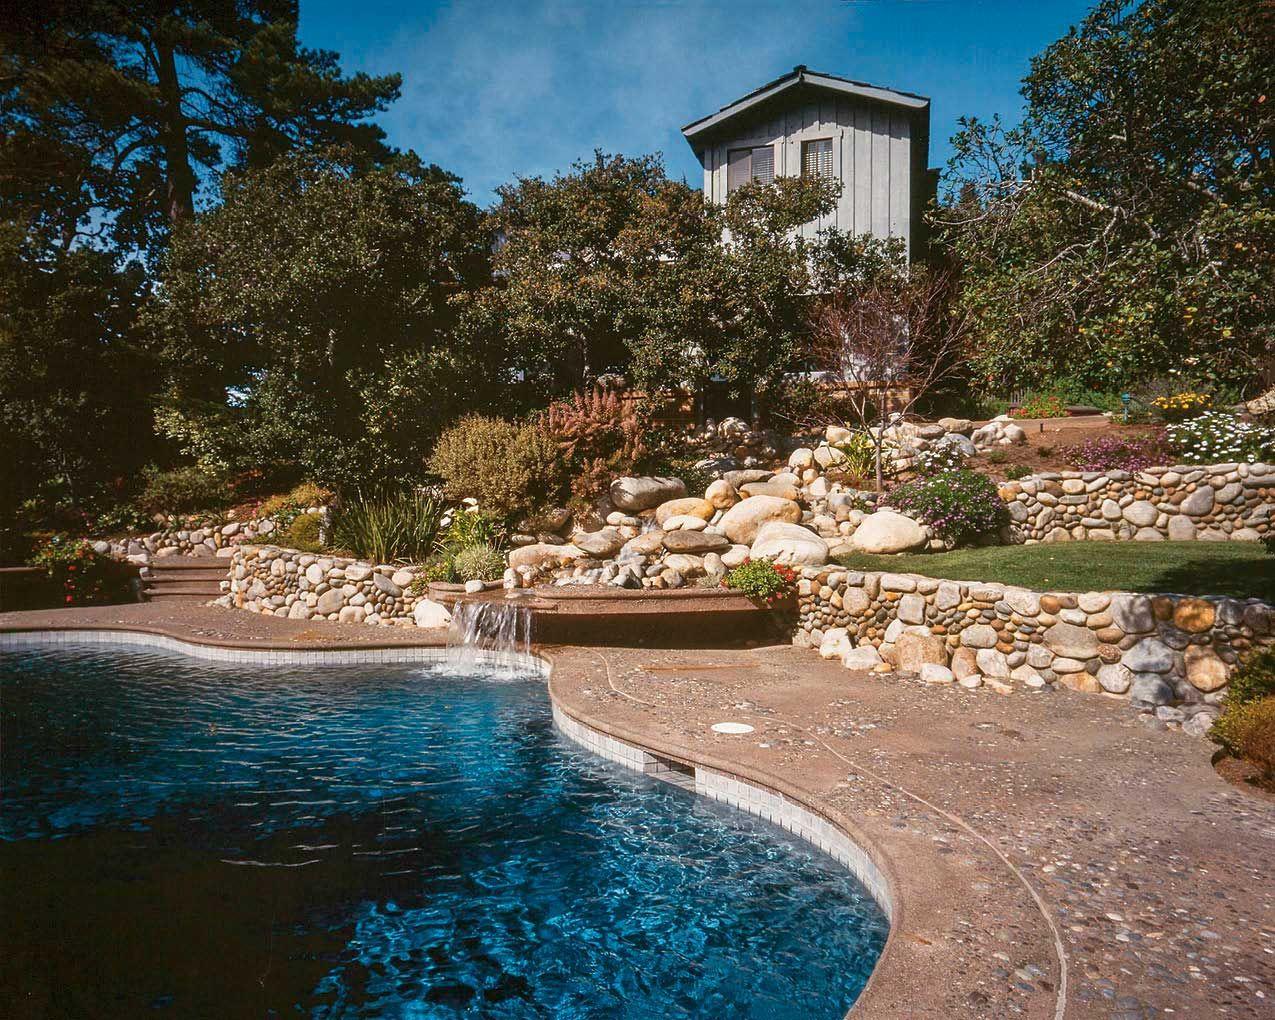 Pin On Concrete Pool Decks And Backyards